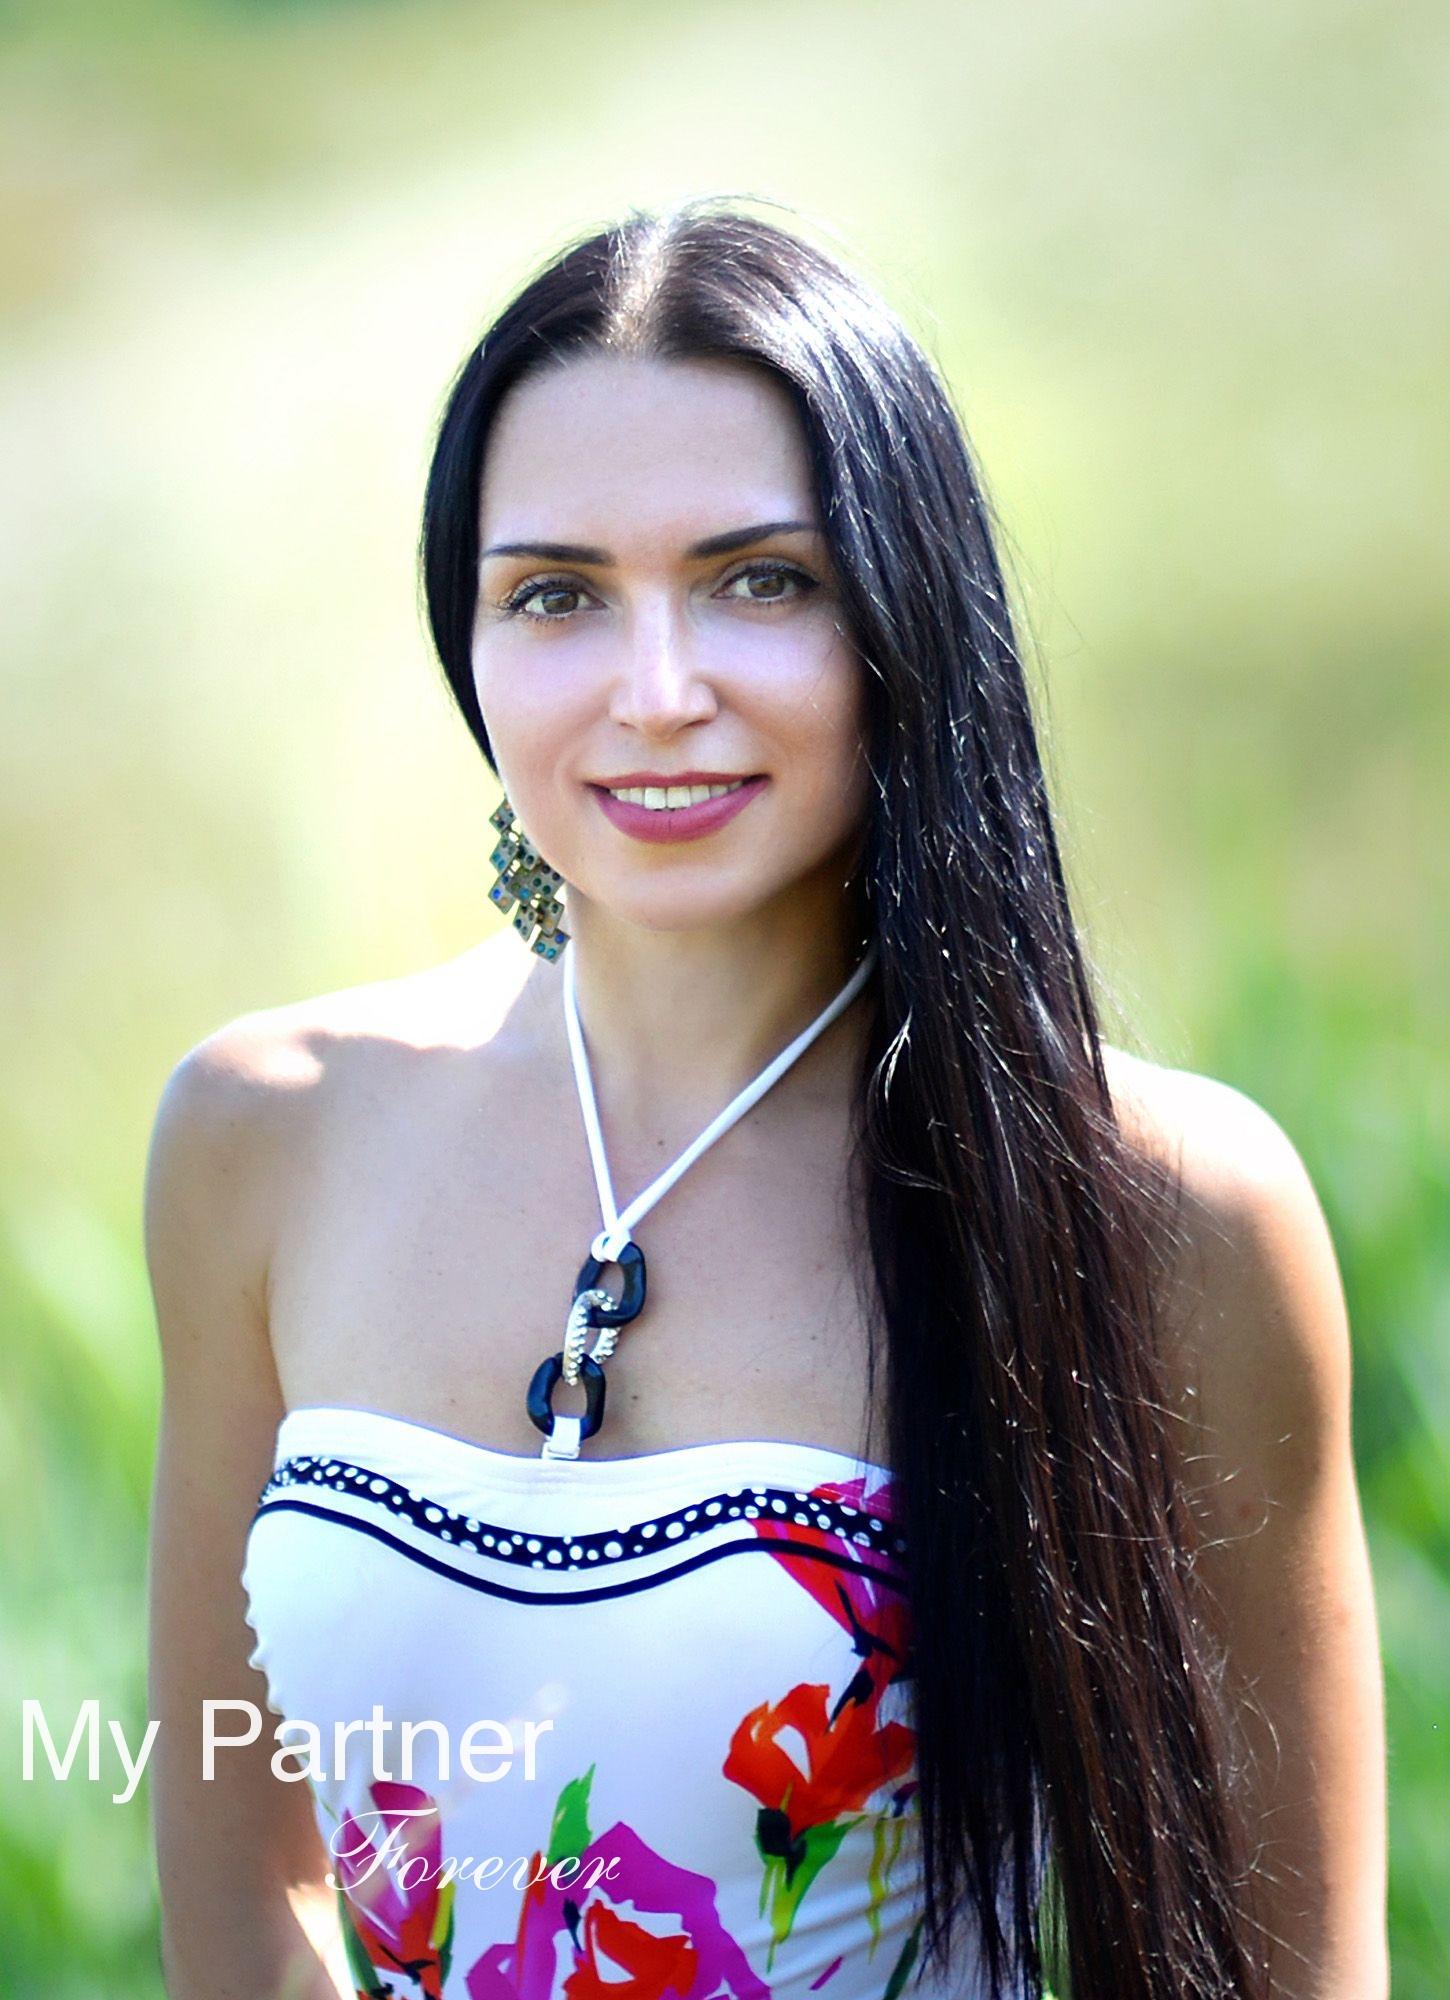 Dating Site to Meet Stunning Ukrainian Girl Elena from Kharkov, Ukraine